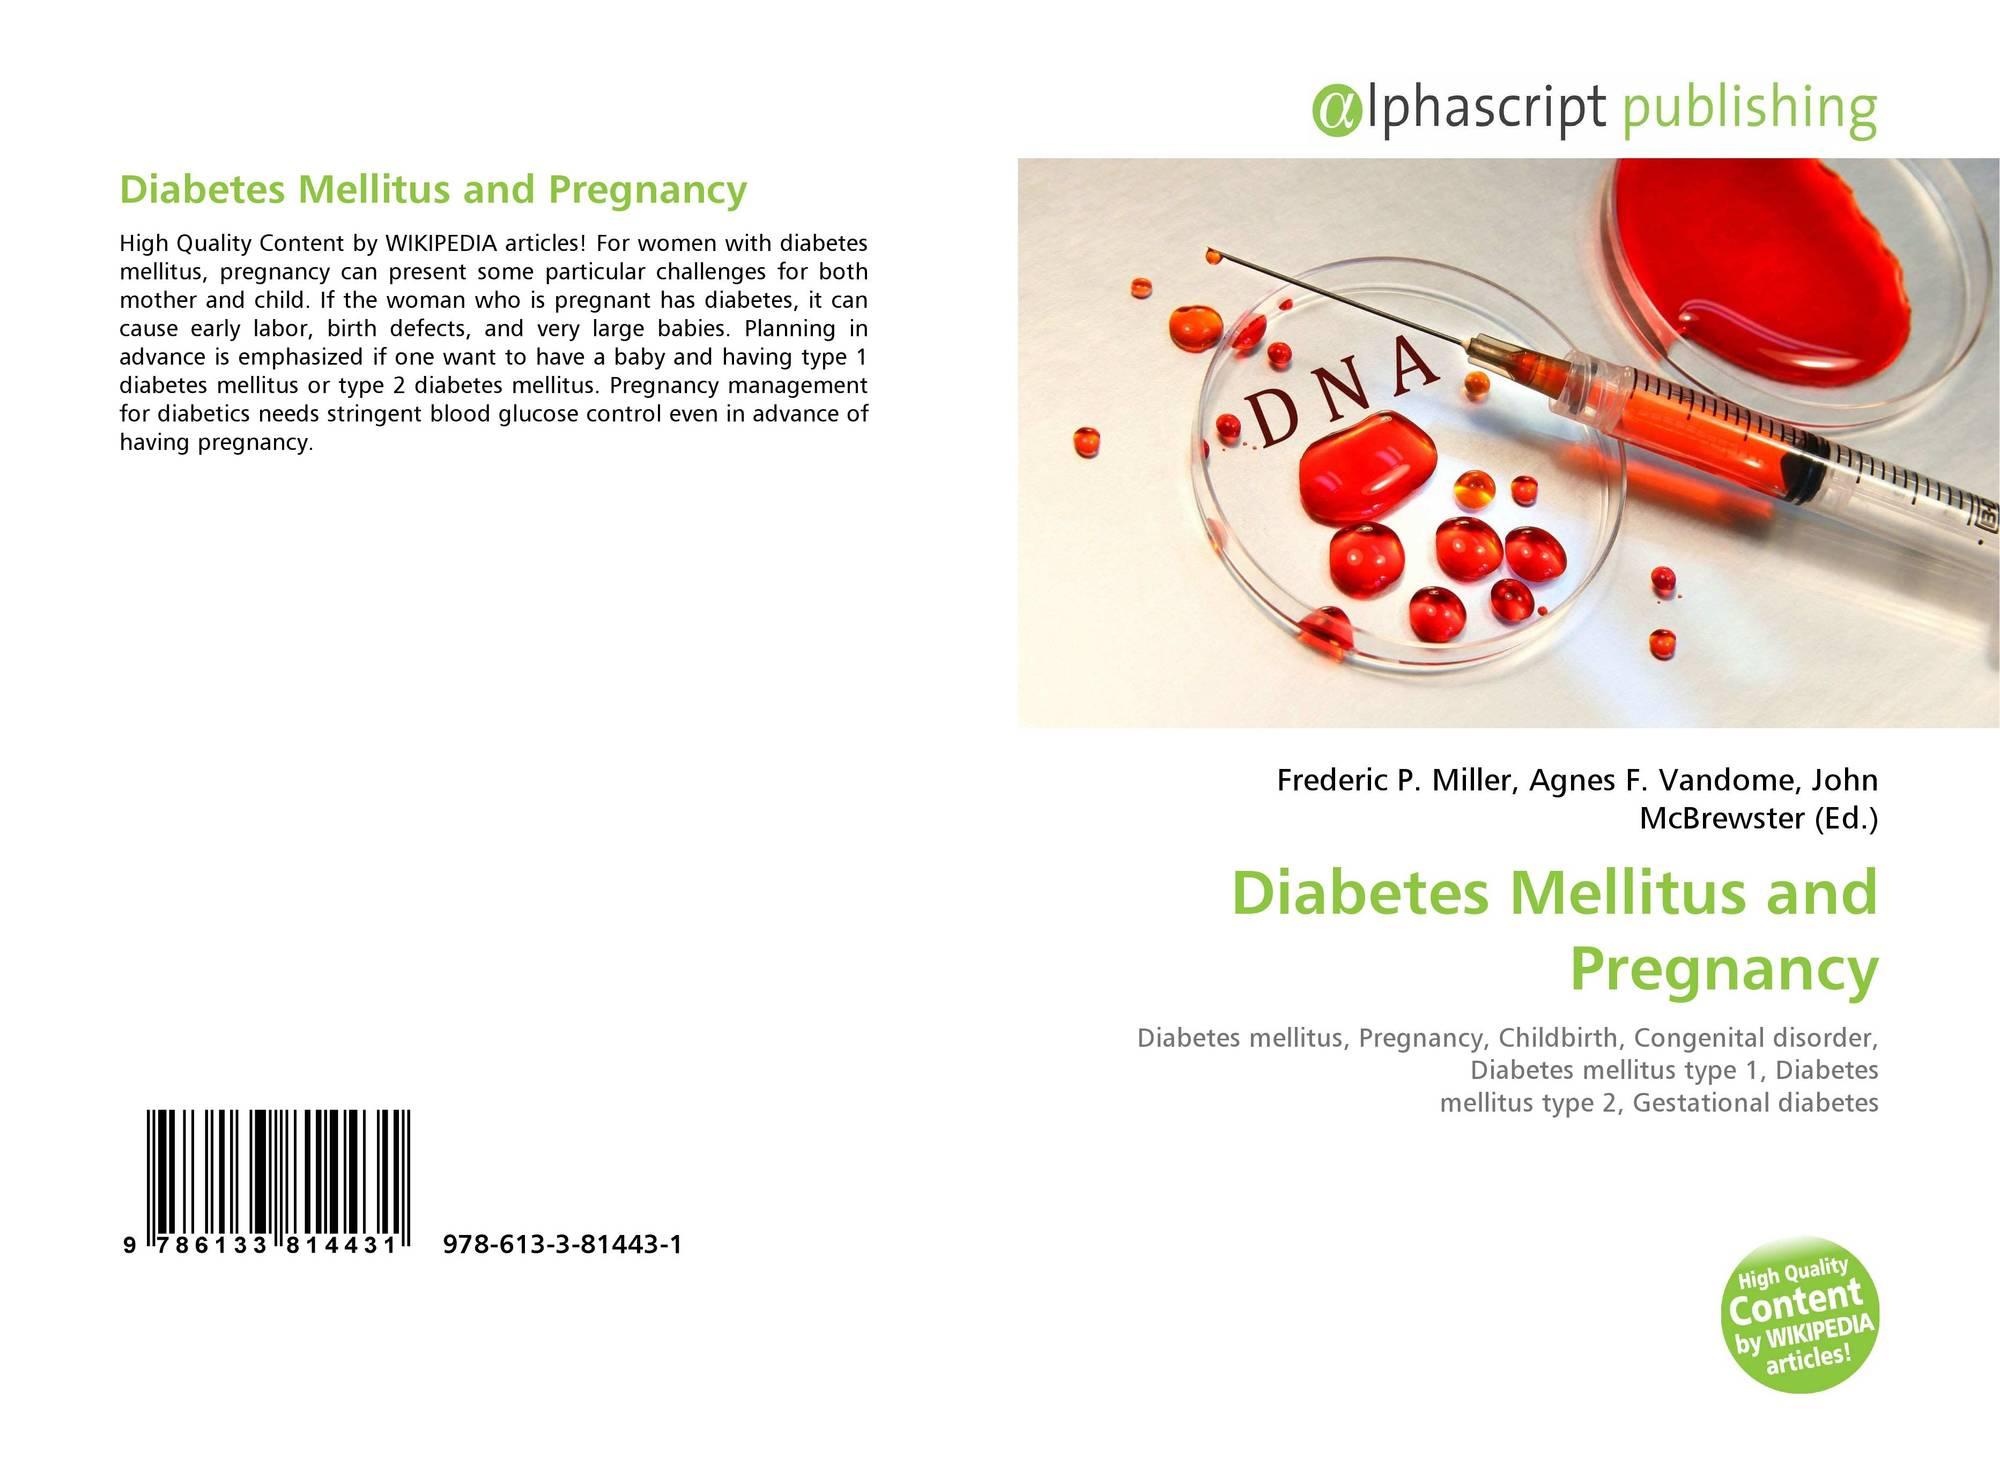 a project on diabetes mellitus juvenile onset diabetes